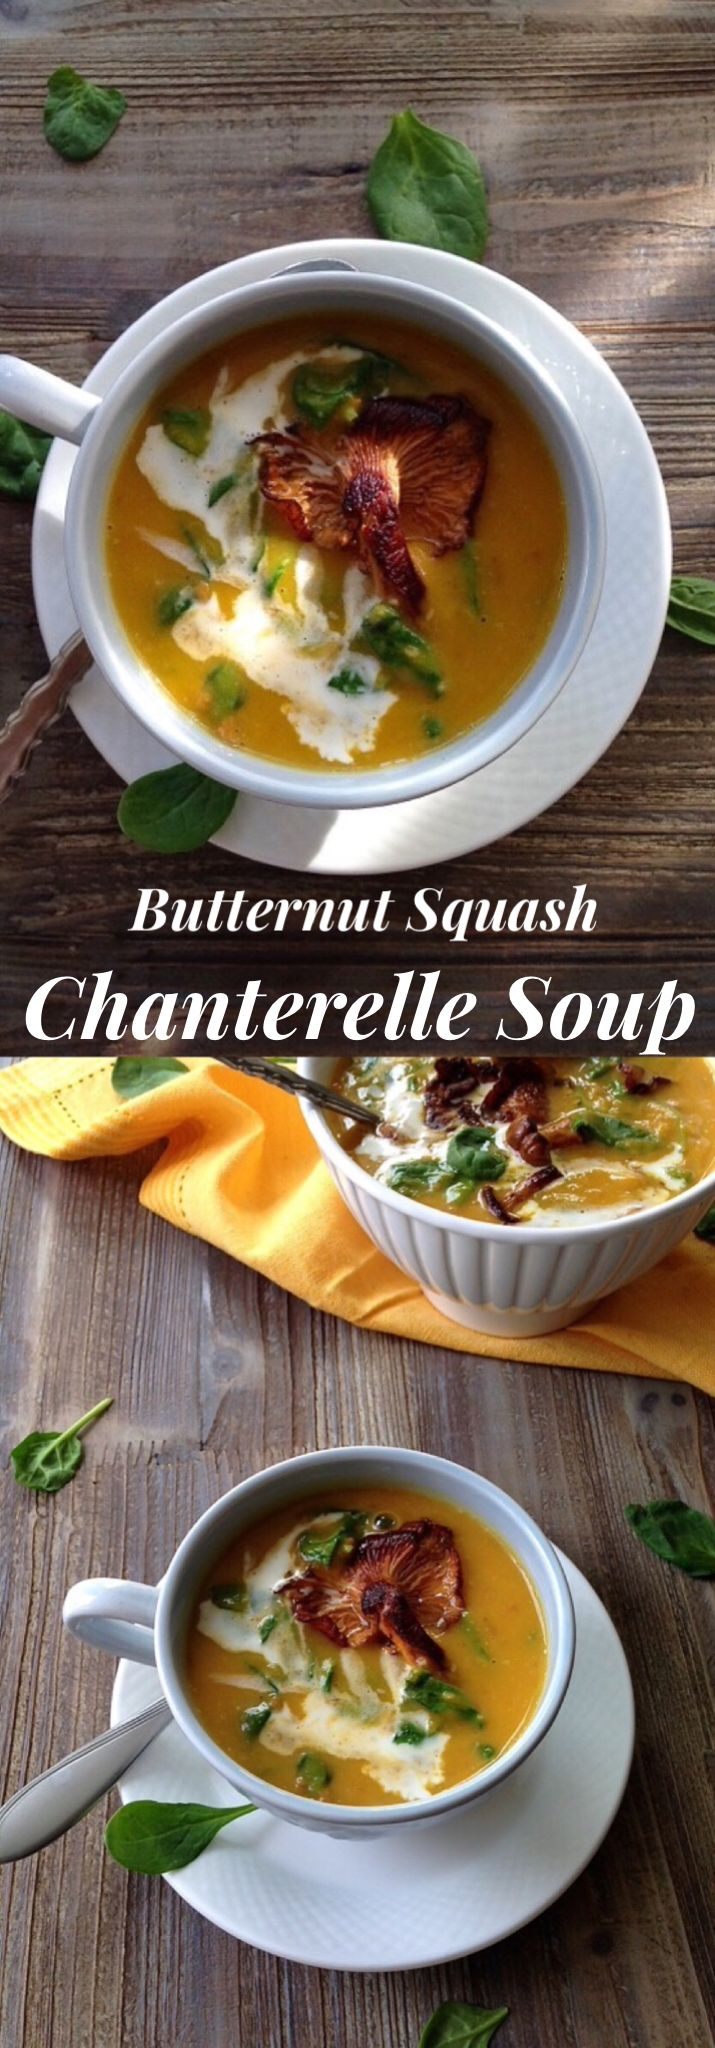 Butternut Squash Chanterelle Soup Recipe | CiaoFlorentina.com @CiaoFlorentina